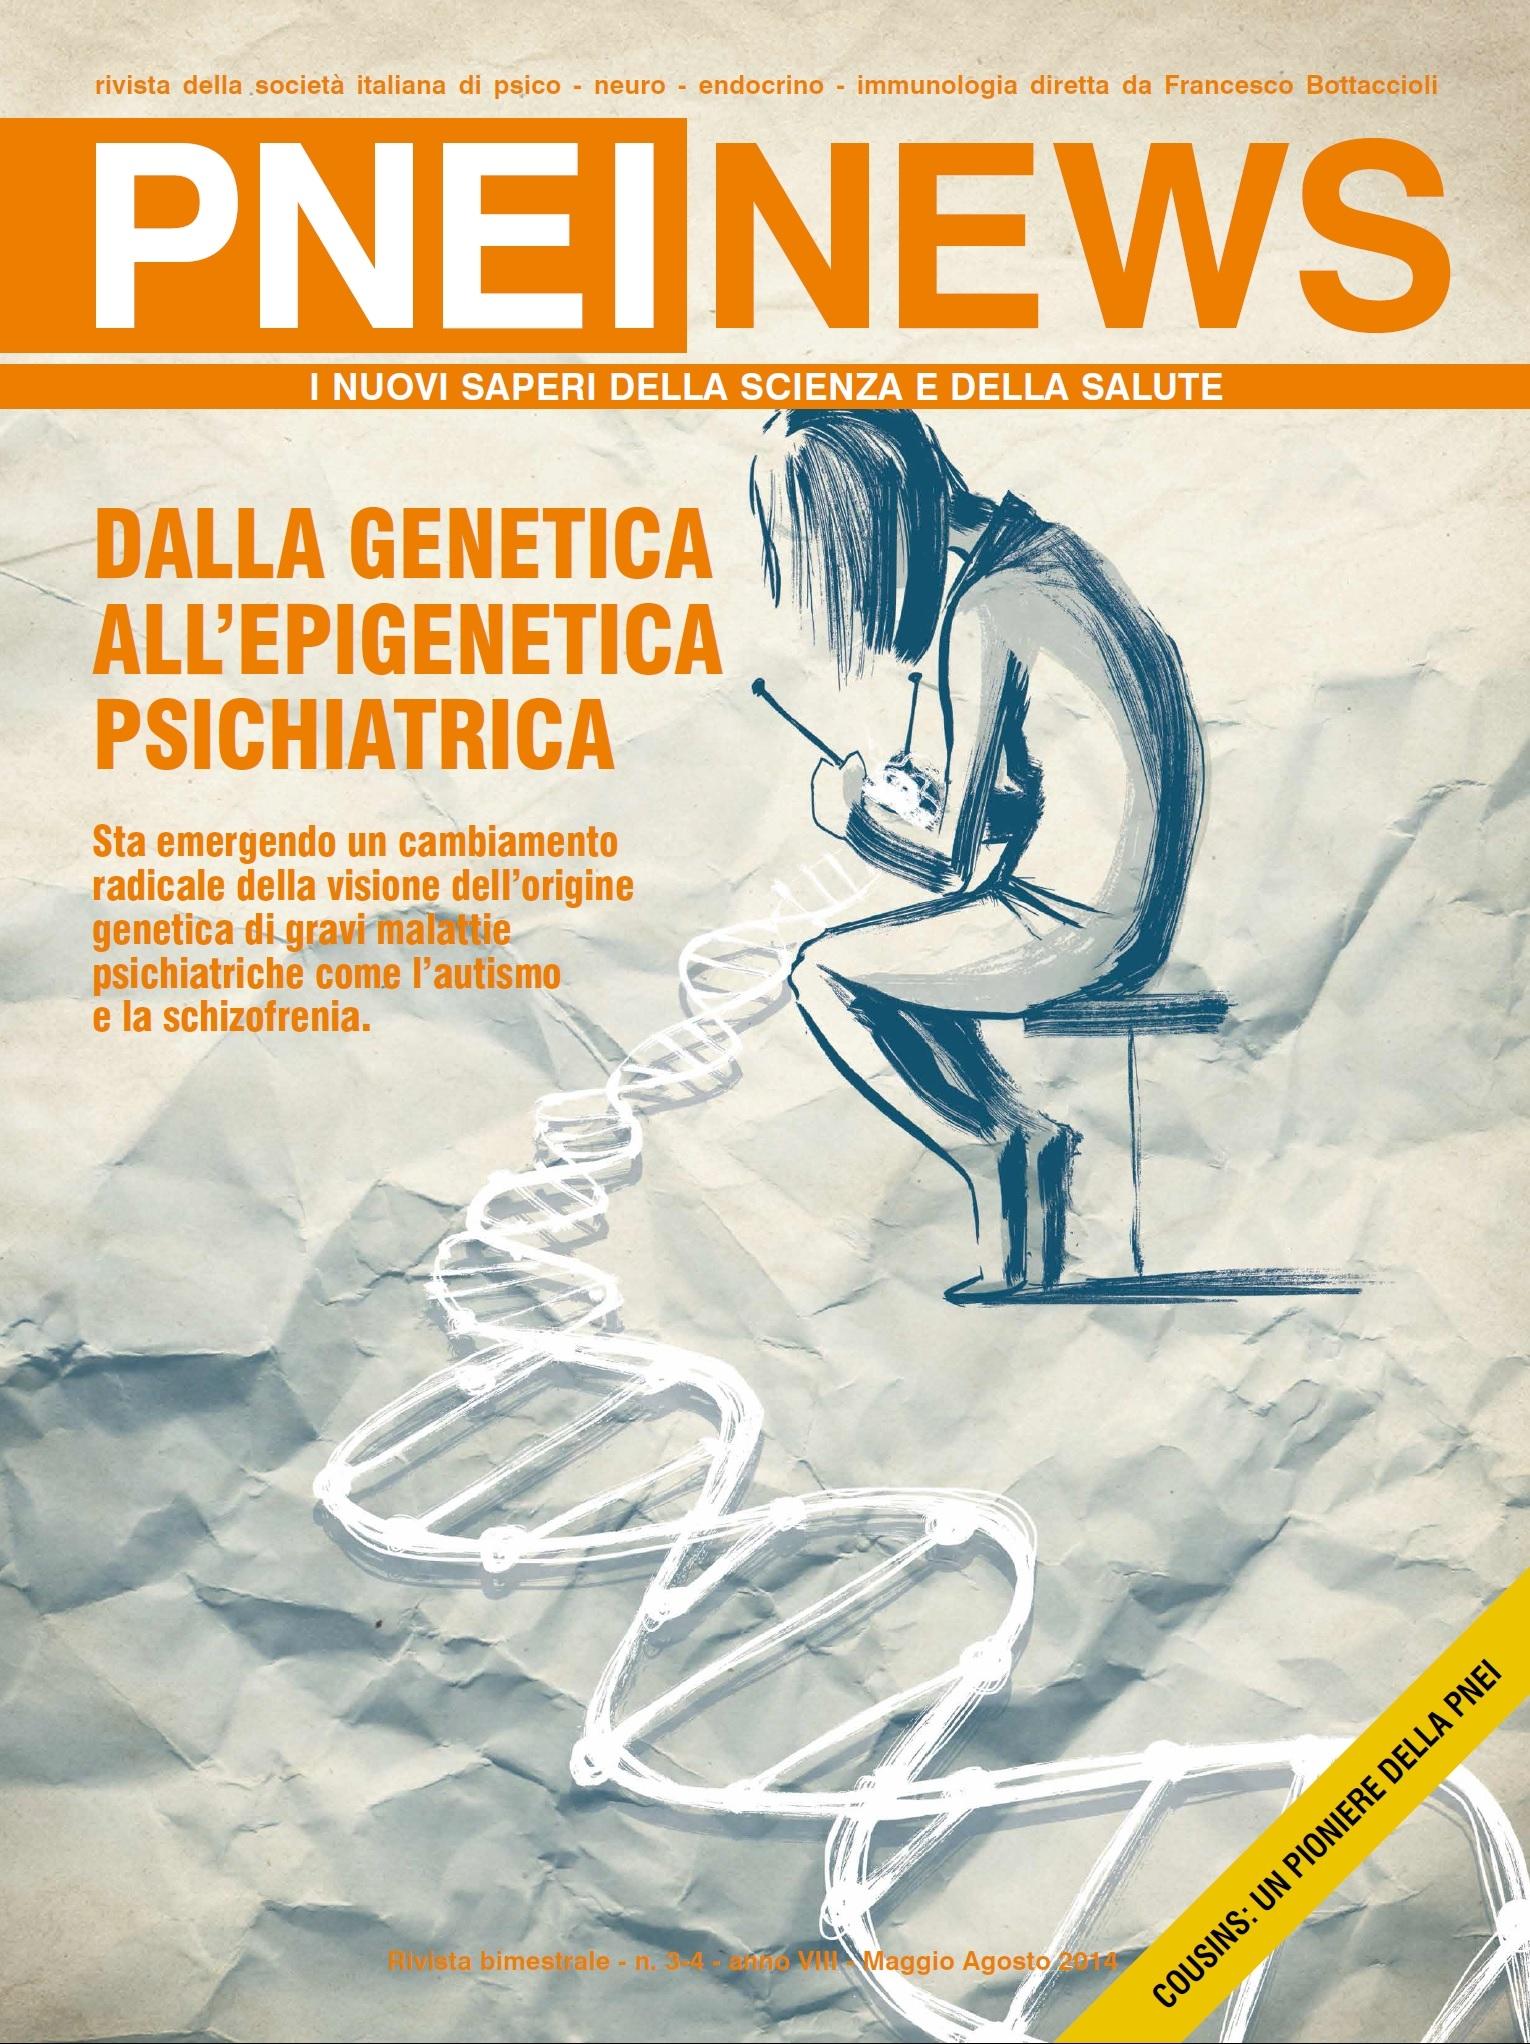 3/4-2014 DALLA GENETICA ALL'EPIGENETICA PSICHIATRICA